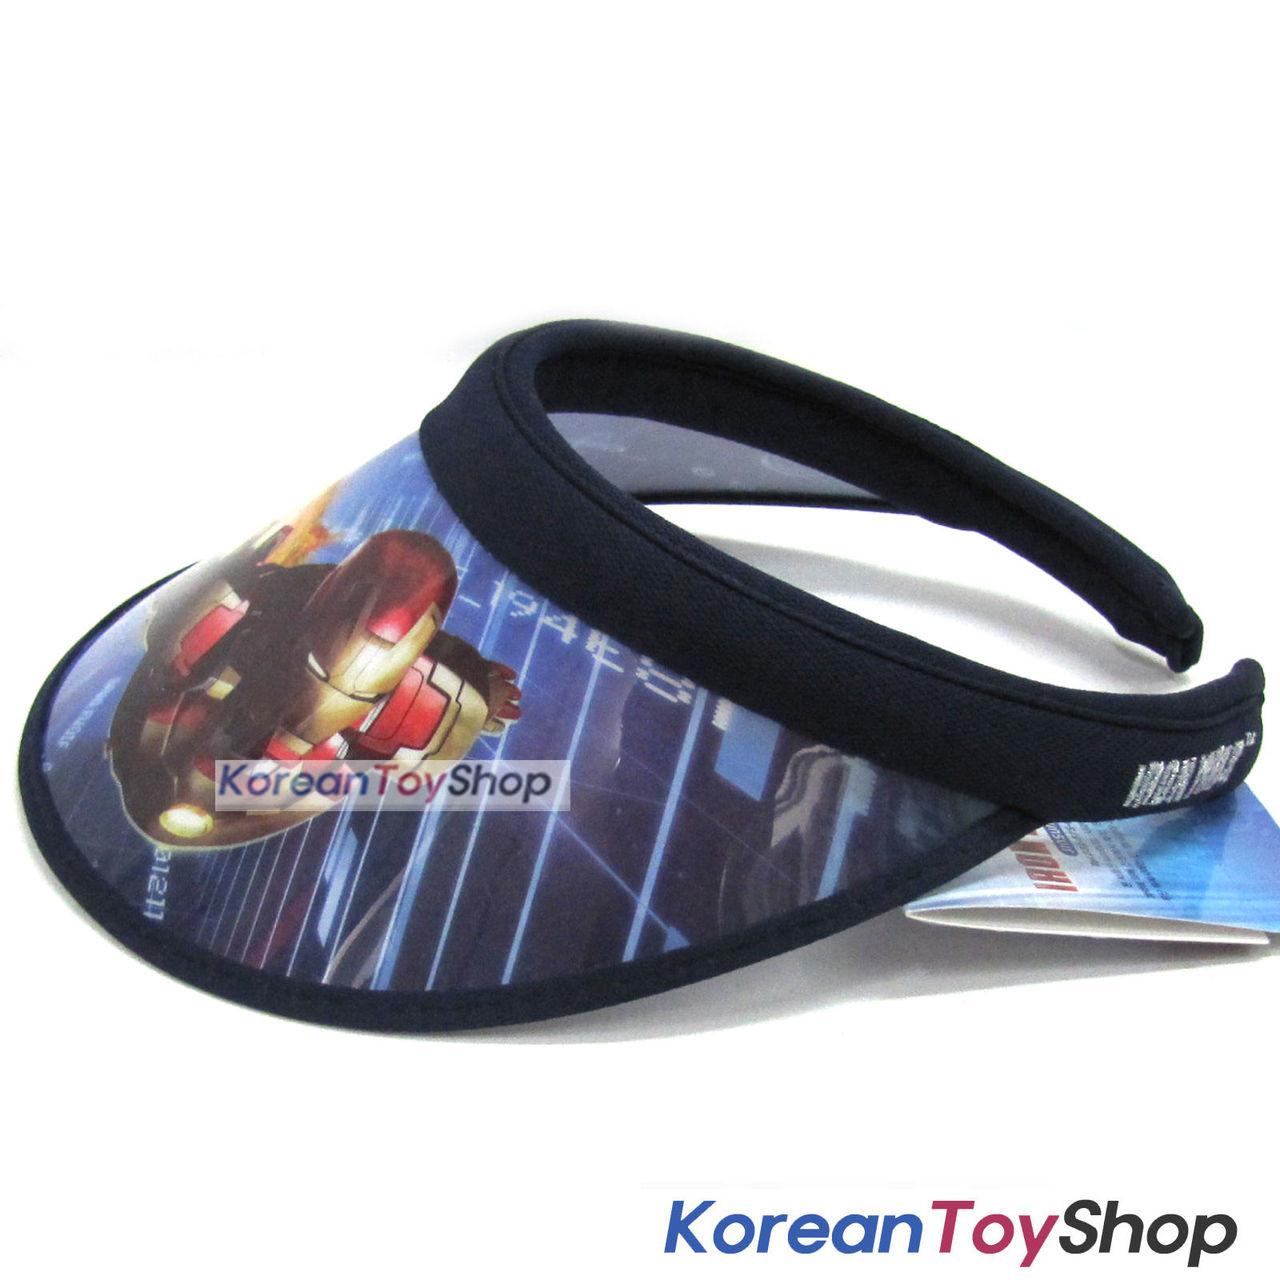 IRON MAN Visor Hat Sun Cap Kids Boy Designed by Korea Dark Blue ... a4700f36a31f